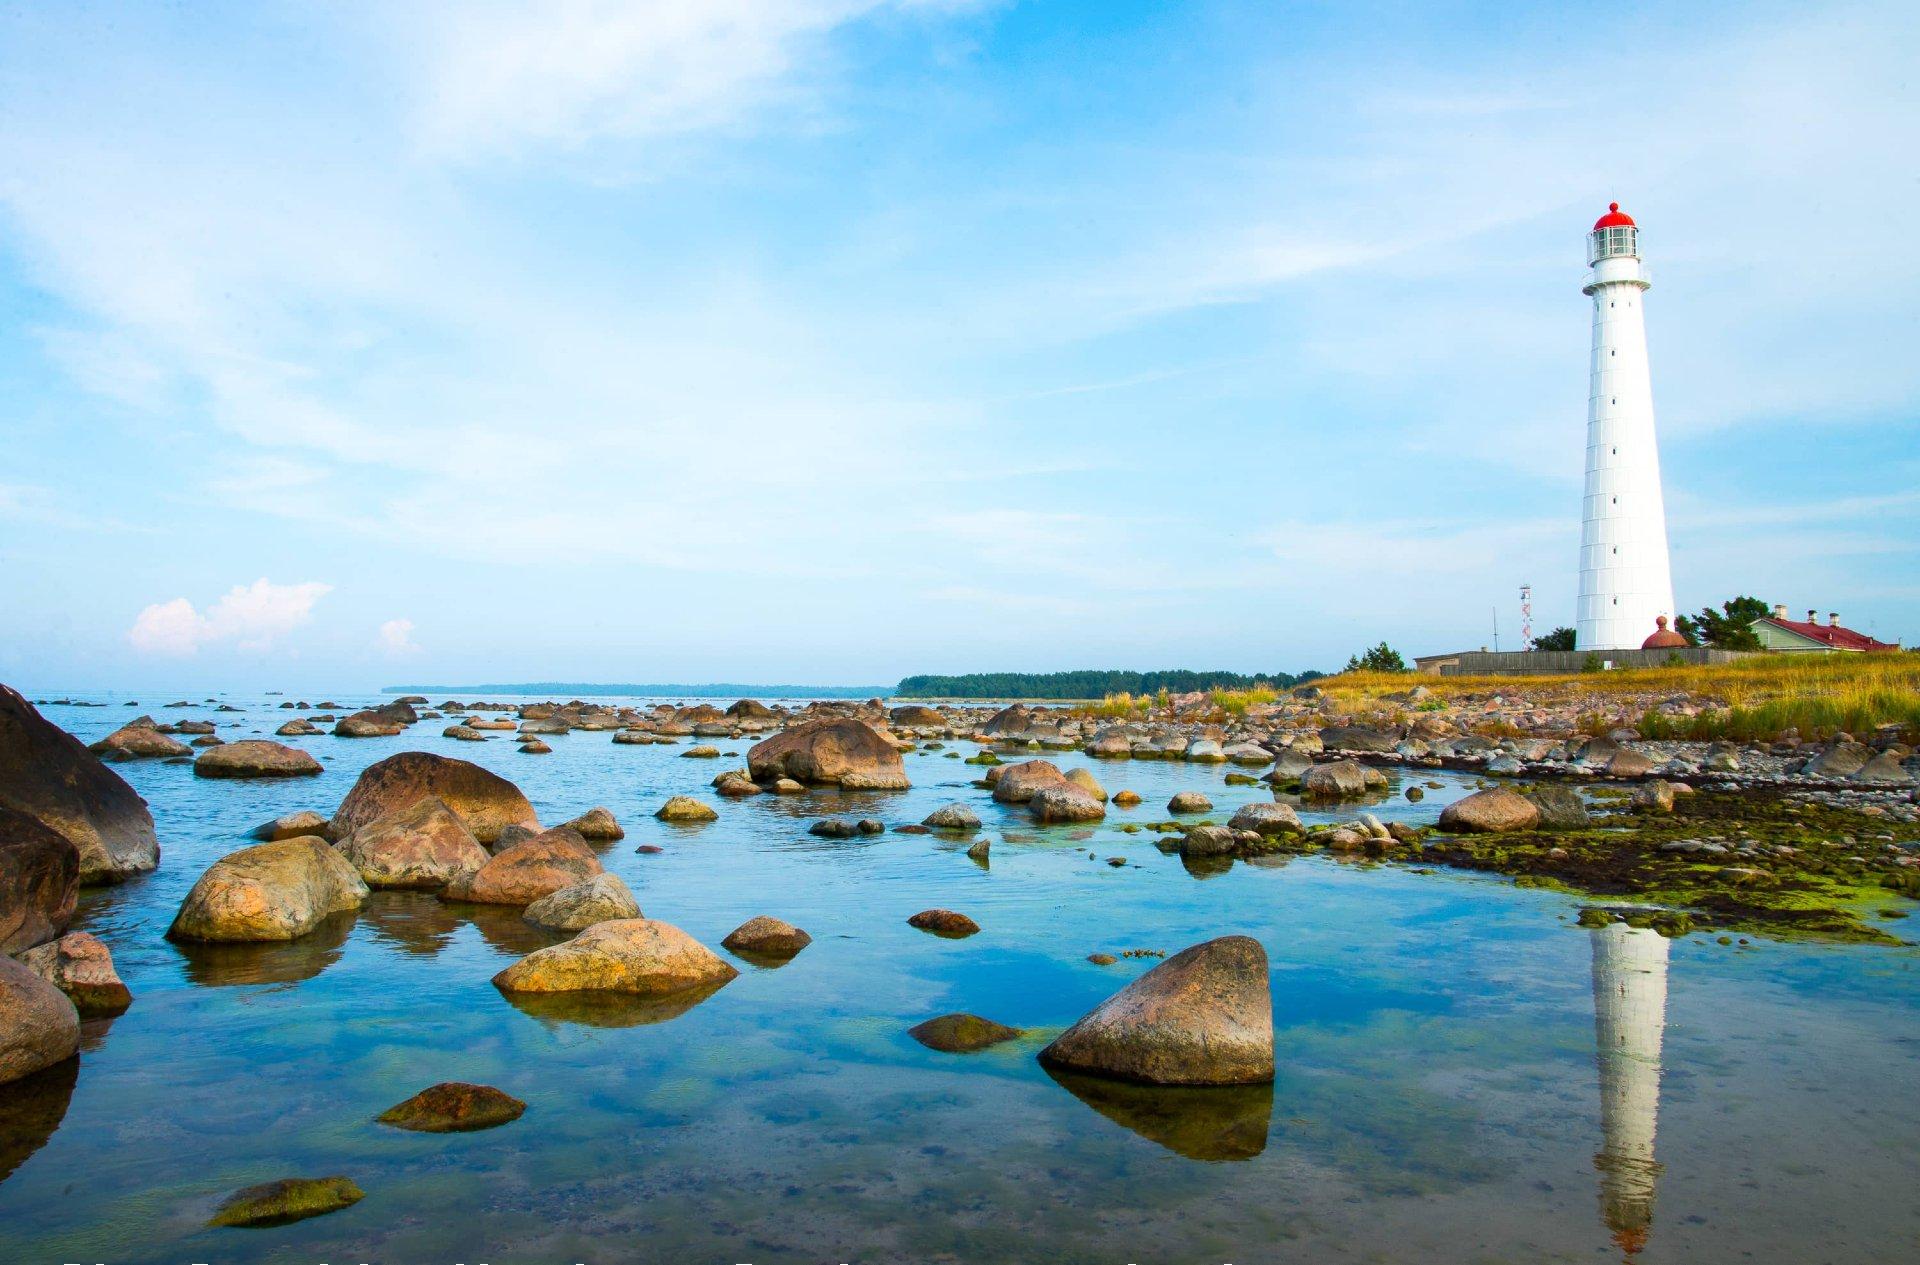 Faro sull'isola di Hiiumaa, Estonia.